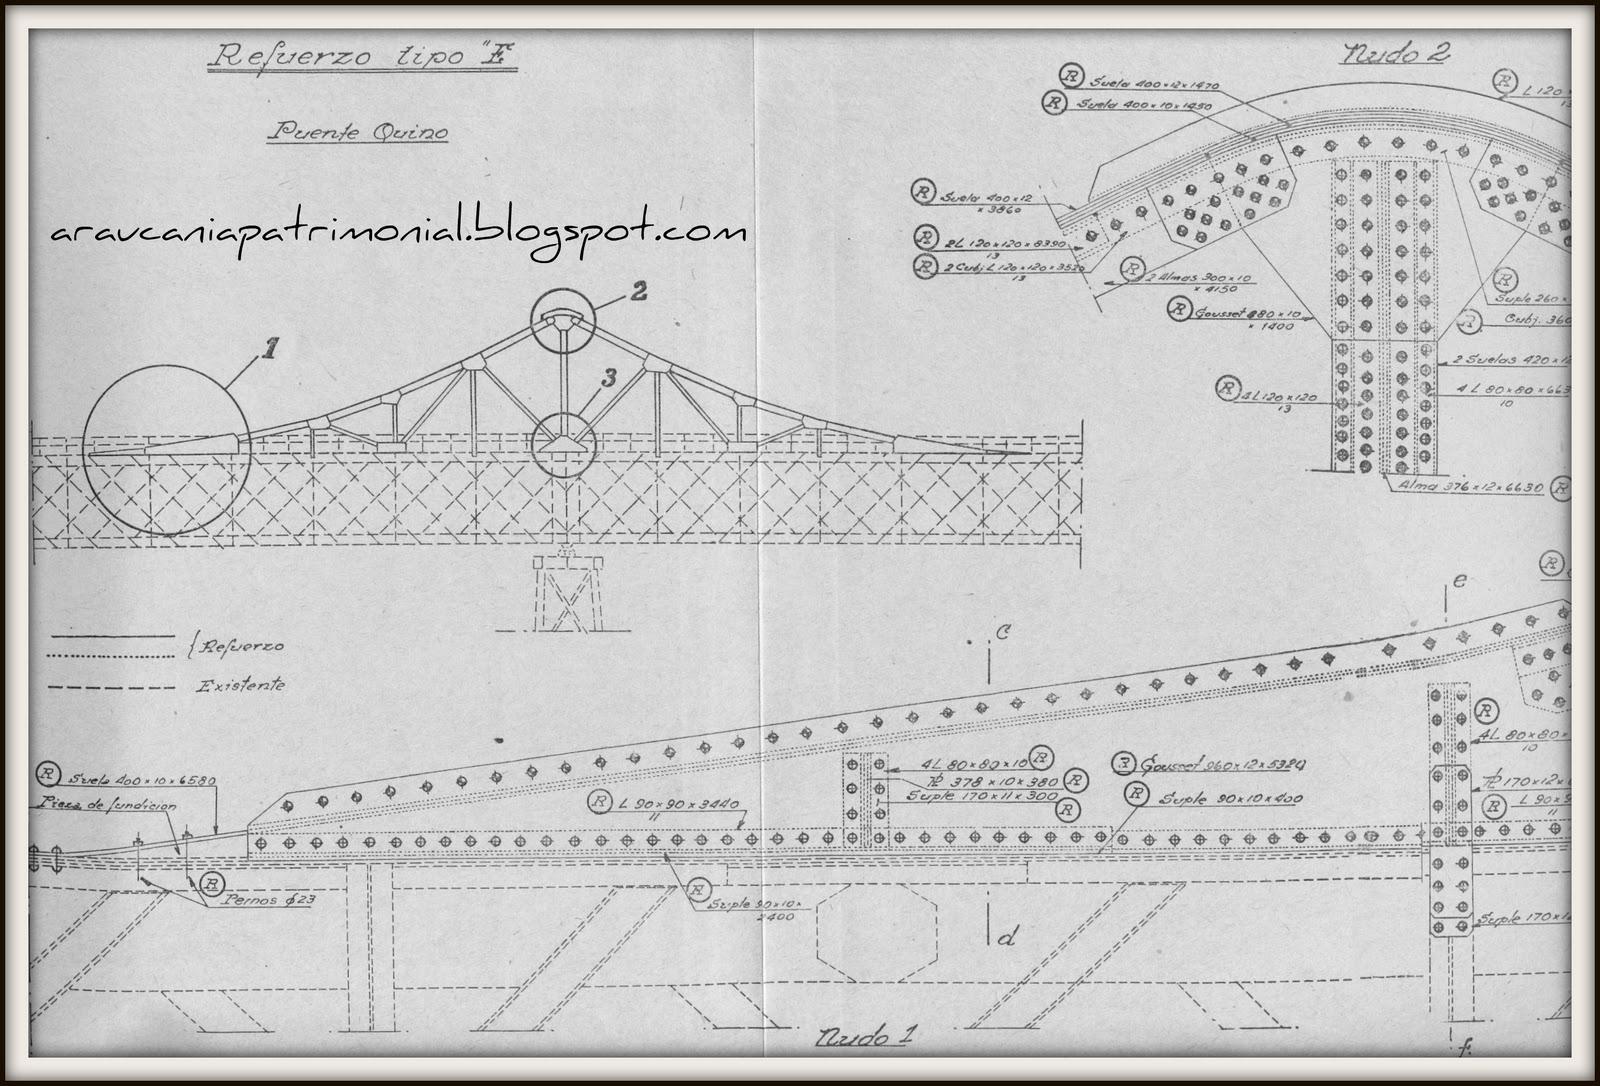 Araucan a historias y patrimonio puente quino superando for Planos ingenieria civil